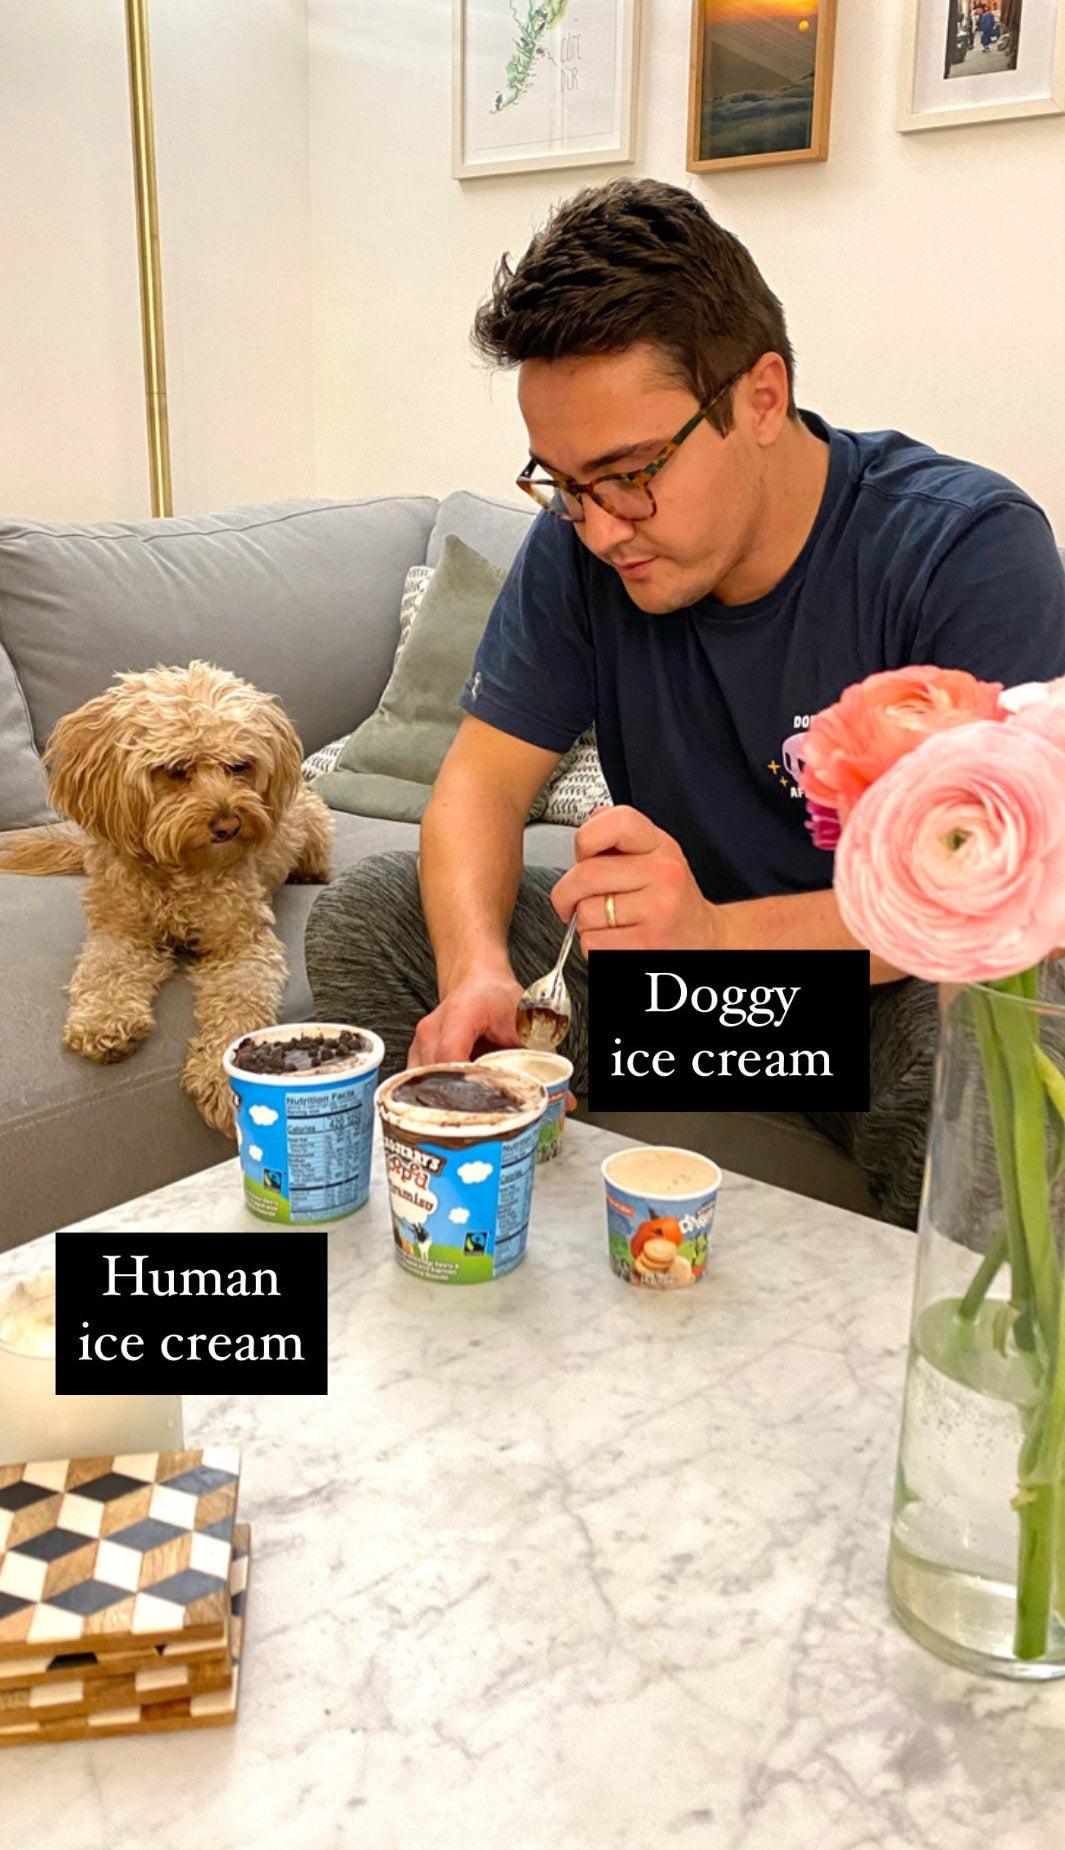 My Husband eating ice cream with Hudson.